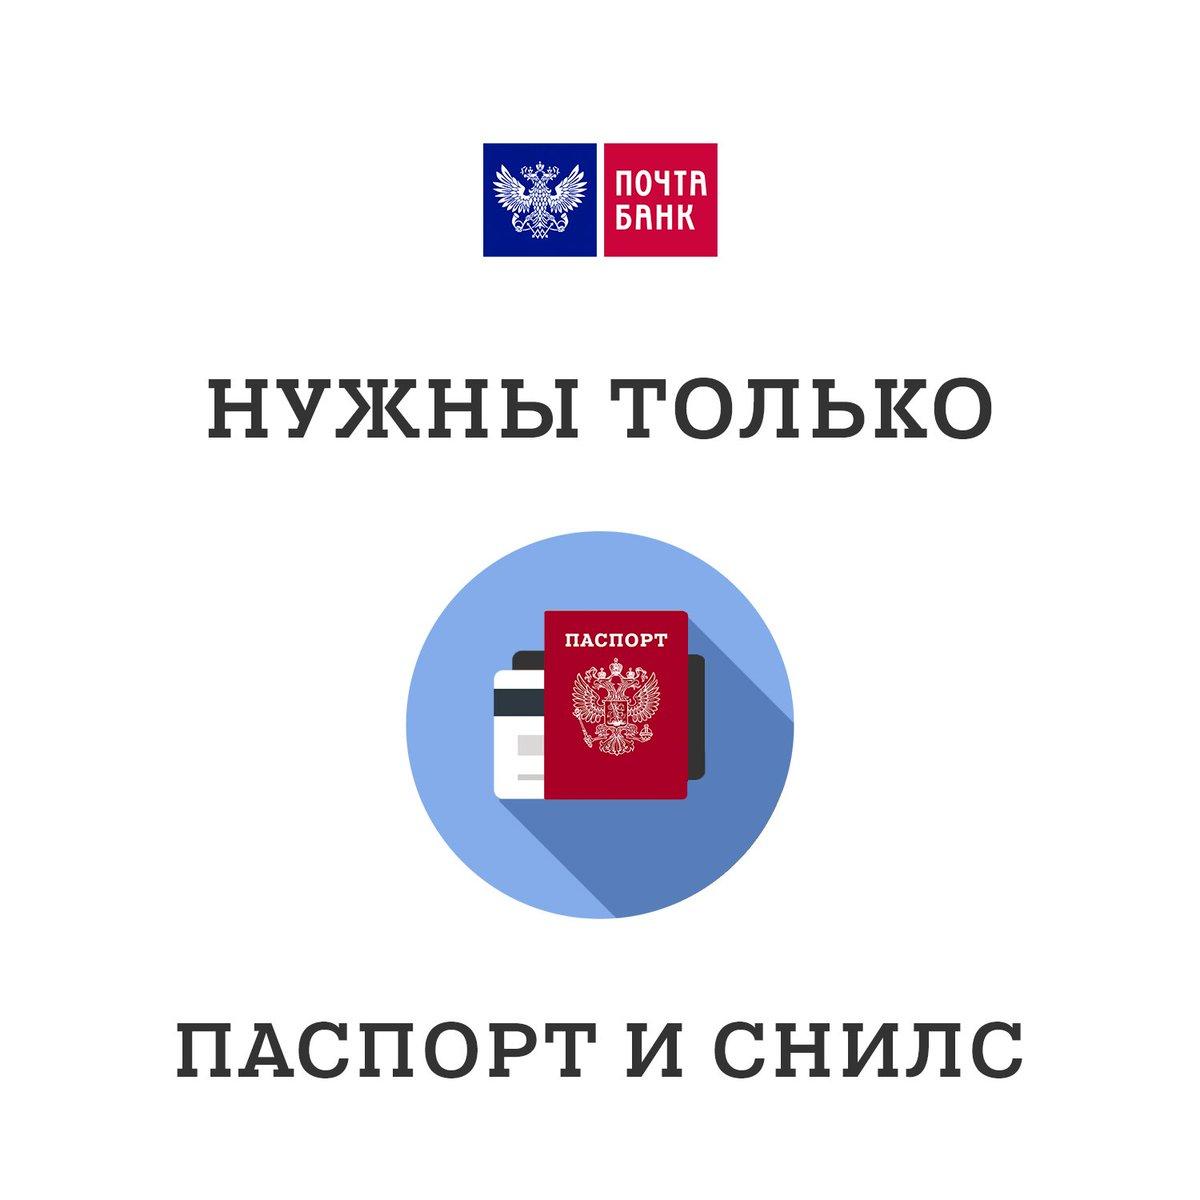 pochta-bank-kredit_10